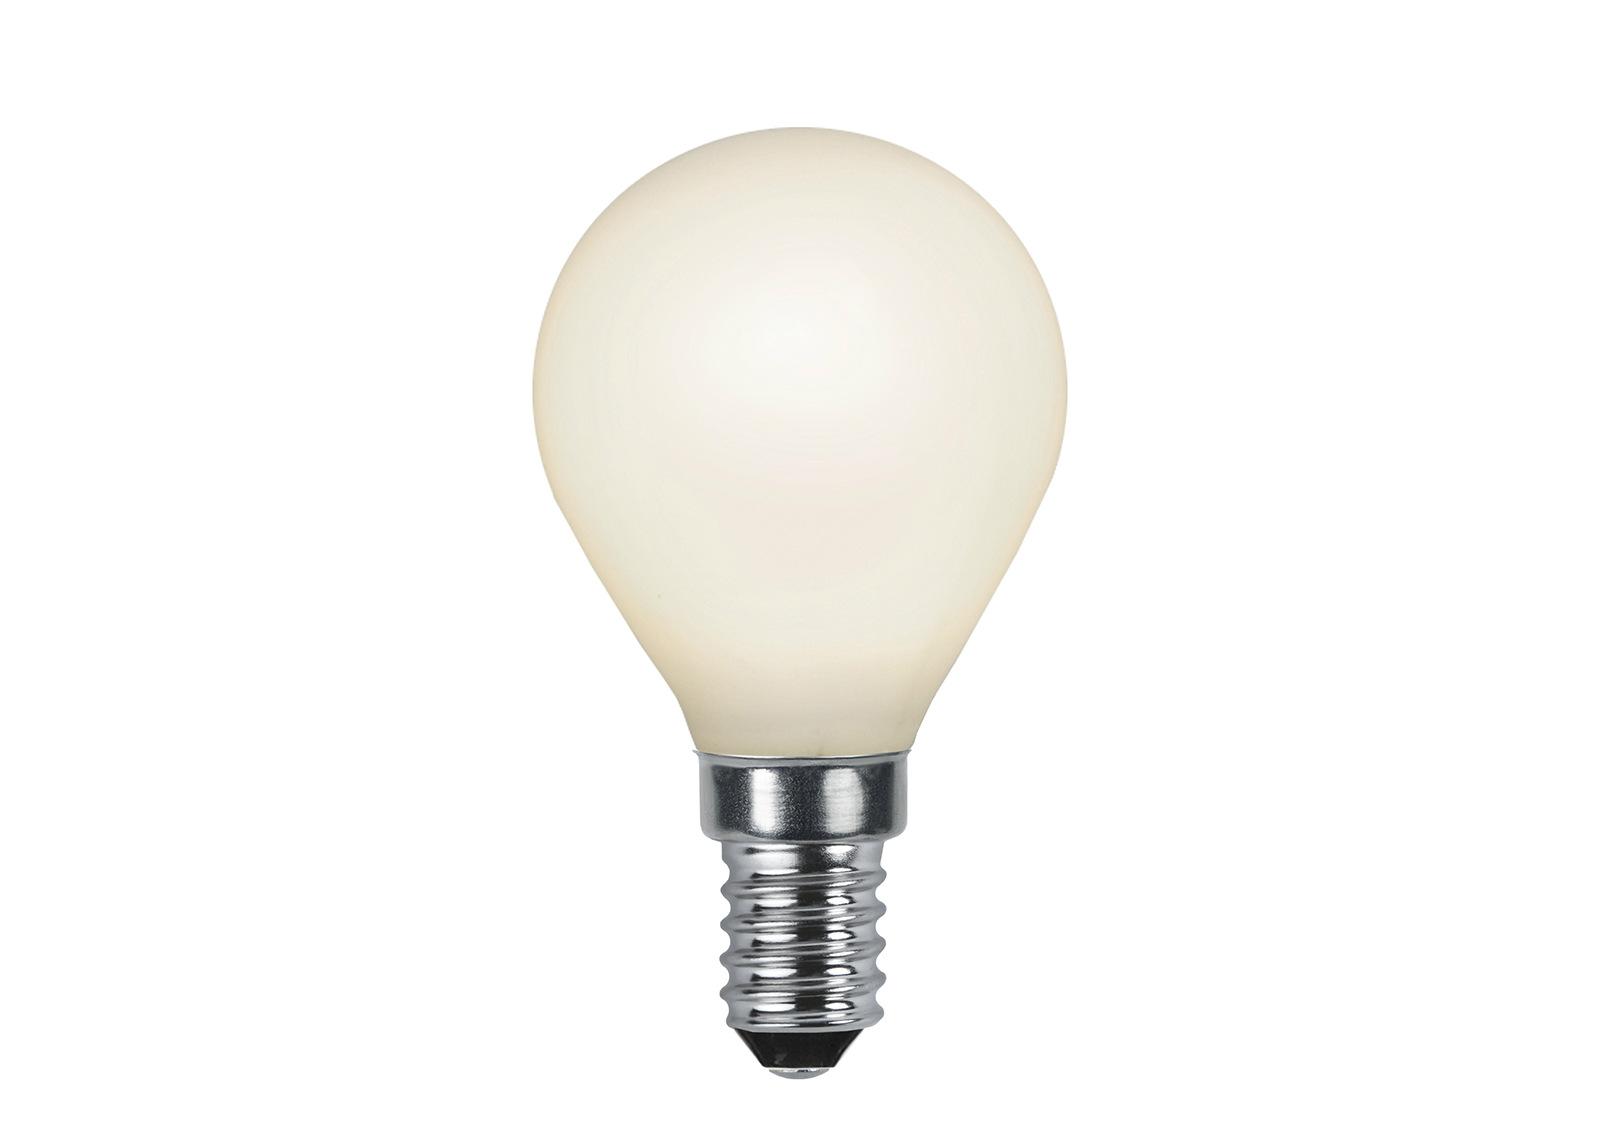 LED sähkölamppu E14 2 W